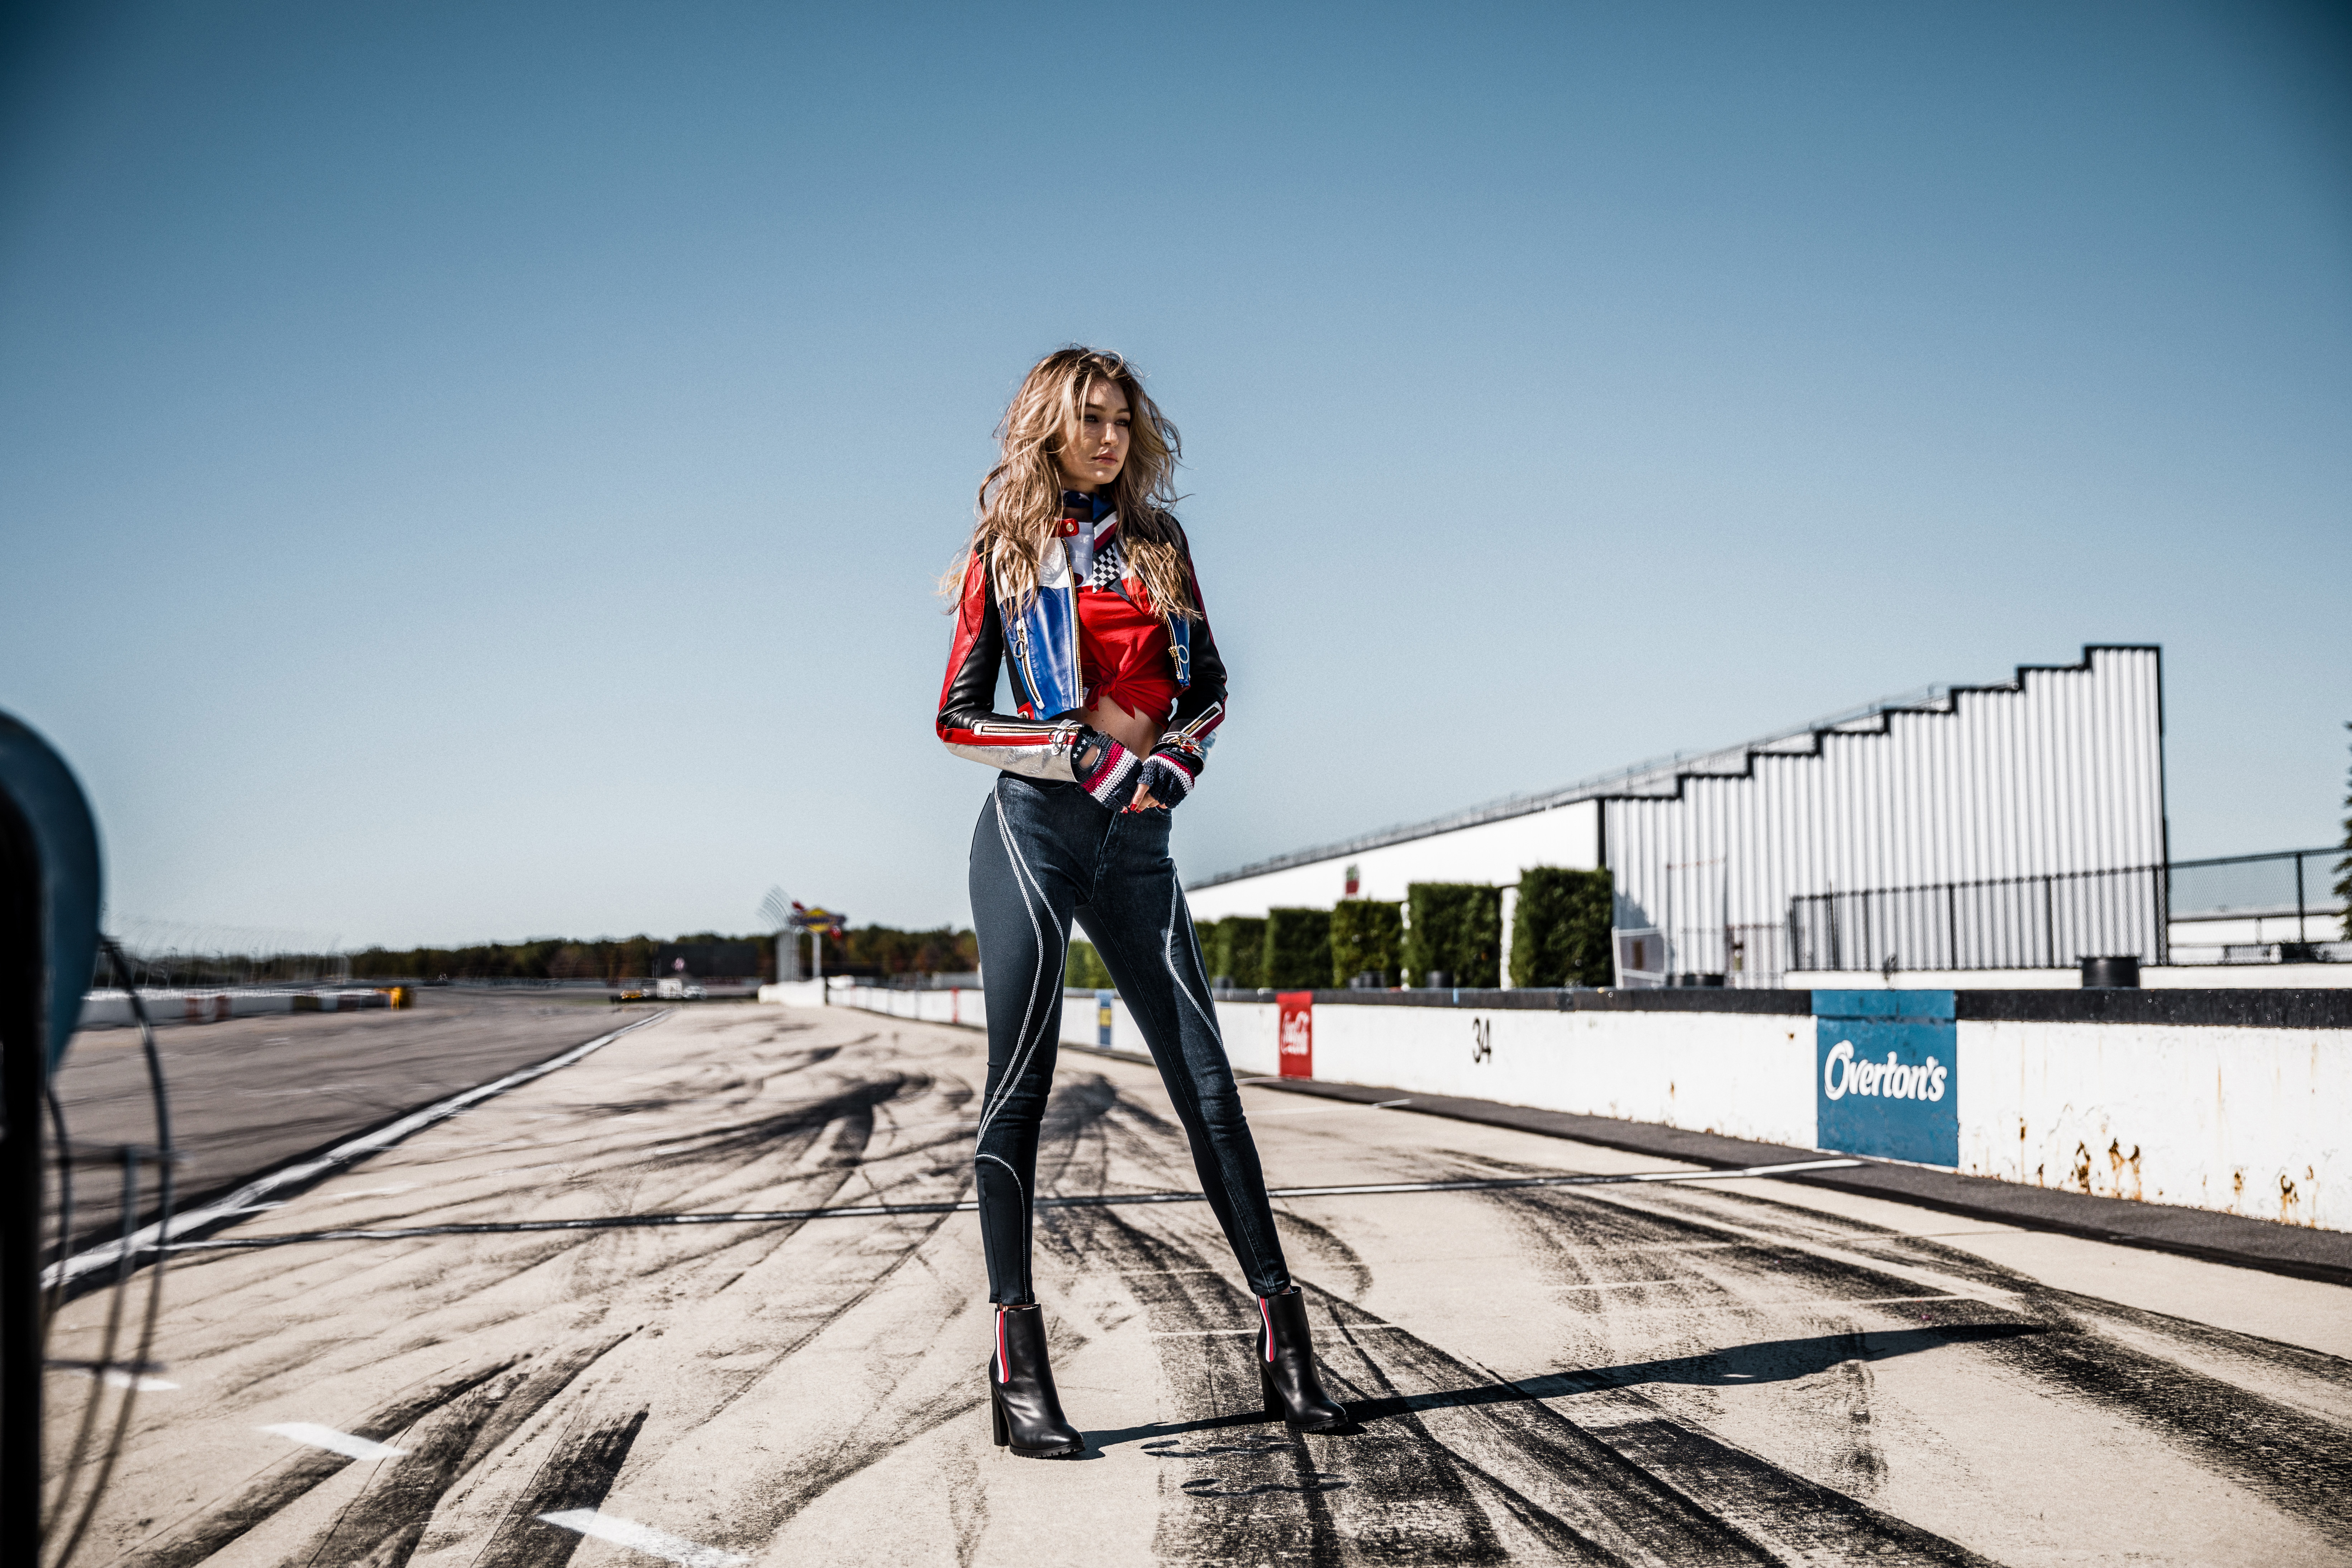 Gigi Hadid Tommy Hilfiger Campaign HD Celebrities 4k Wallpapers